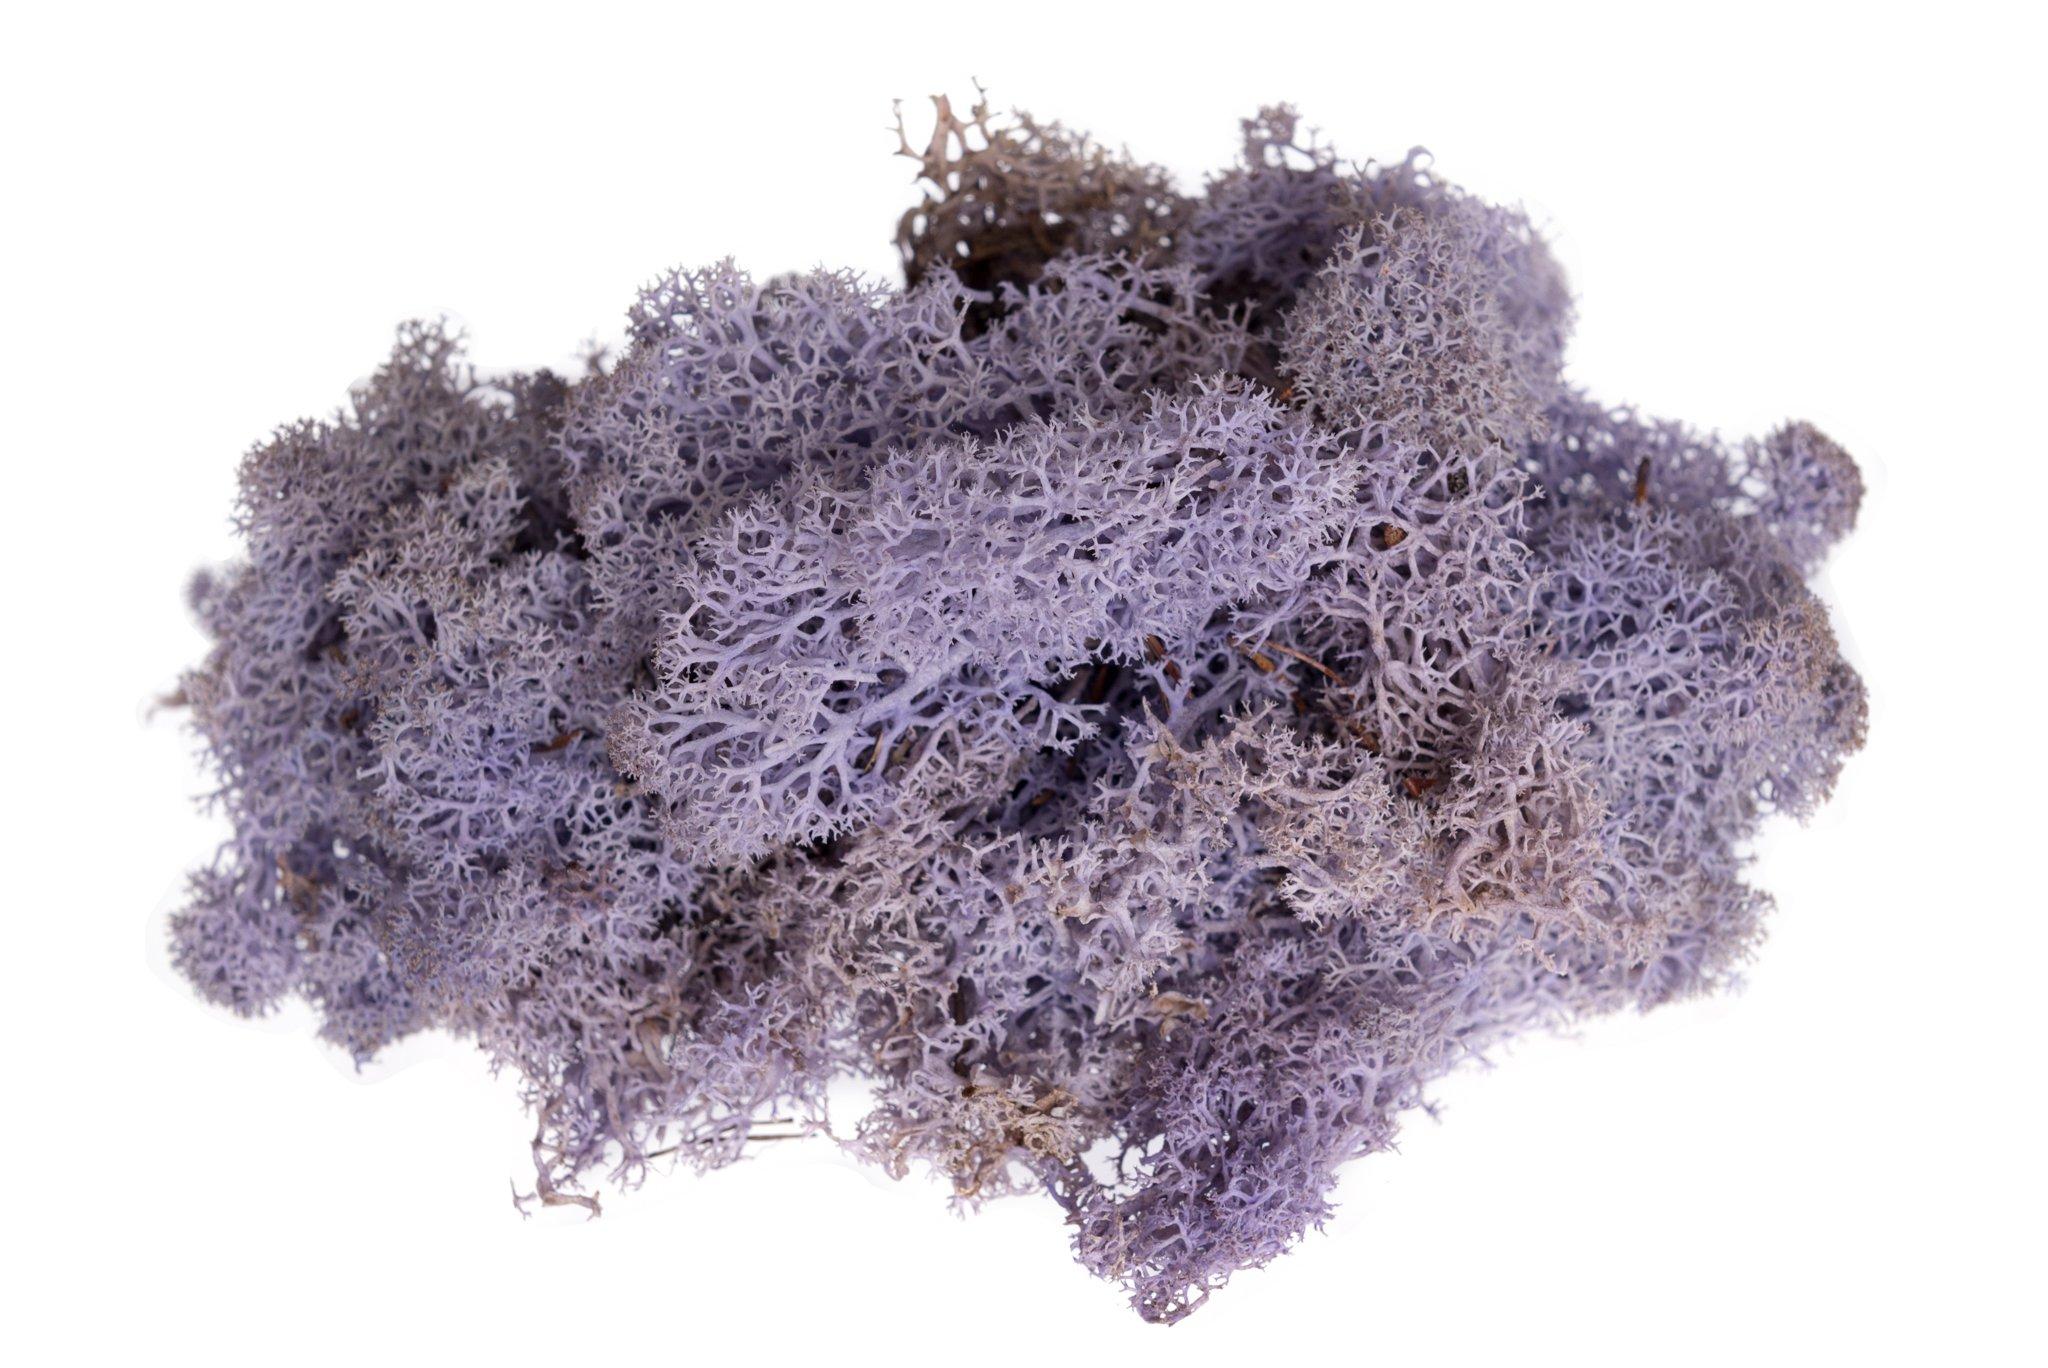 Hinterland Trading Soft Reindeer Moss, 3-Ounce (Lavender)